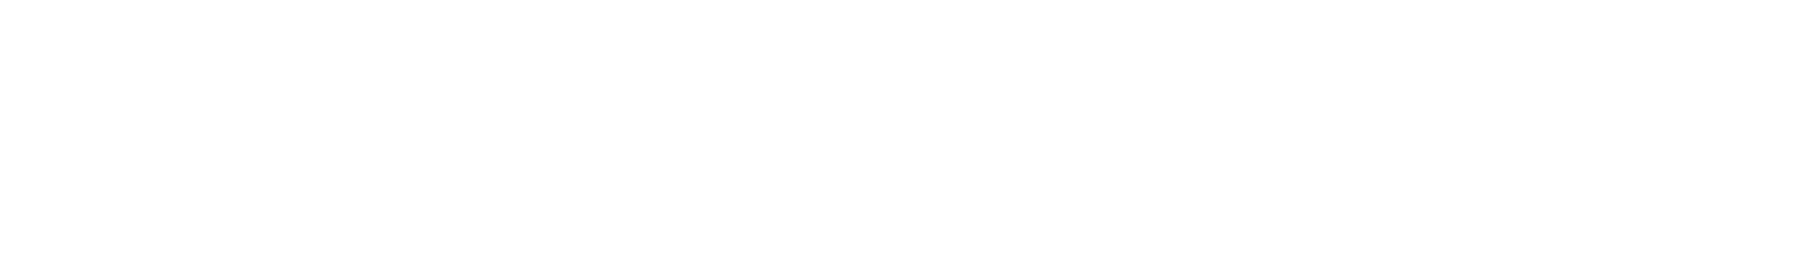 seq9 142